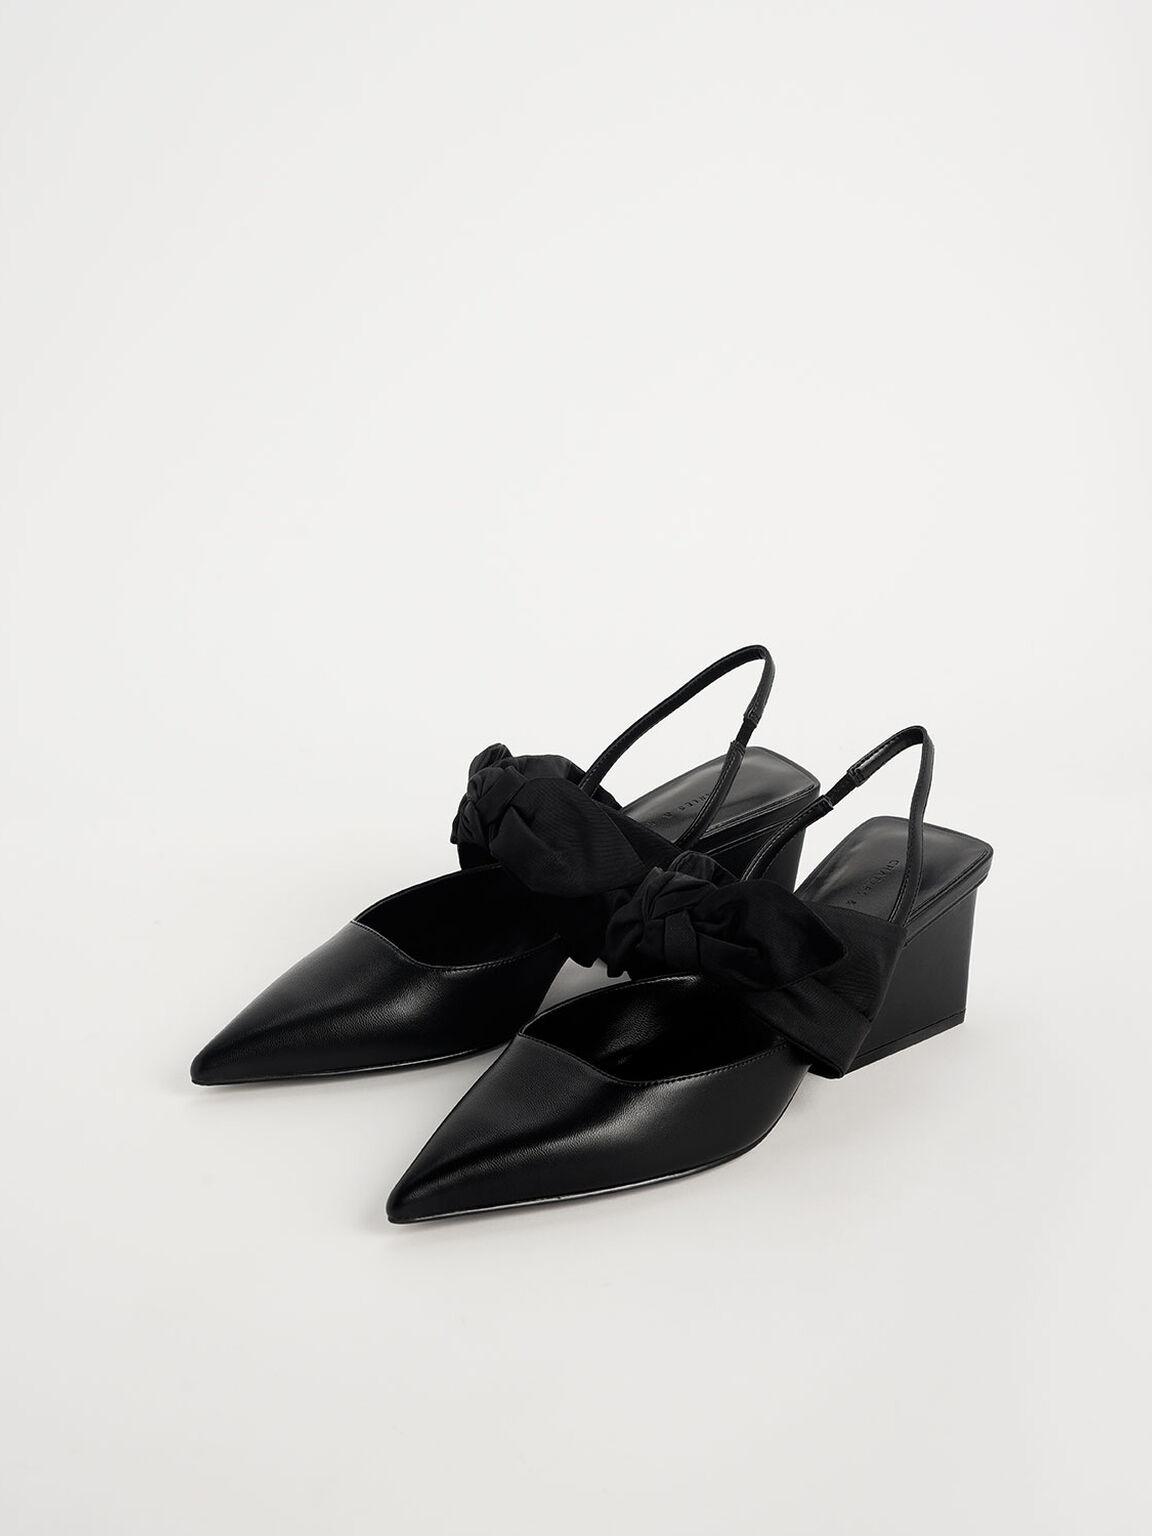 Grosgrain Bow Chunky Heel Slingback Pumps, Black, hi-res